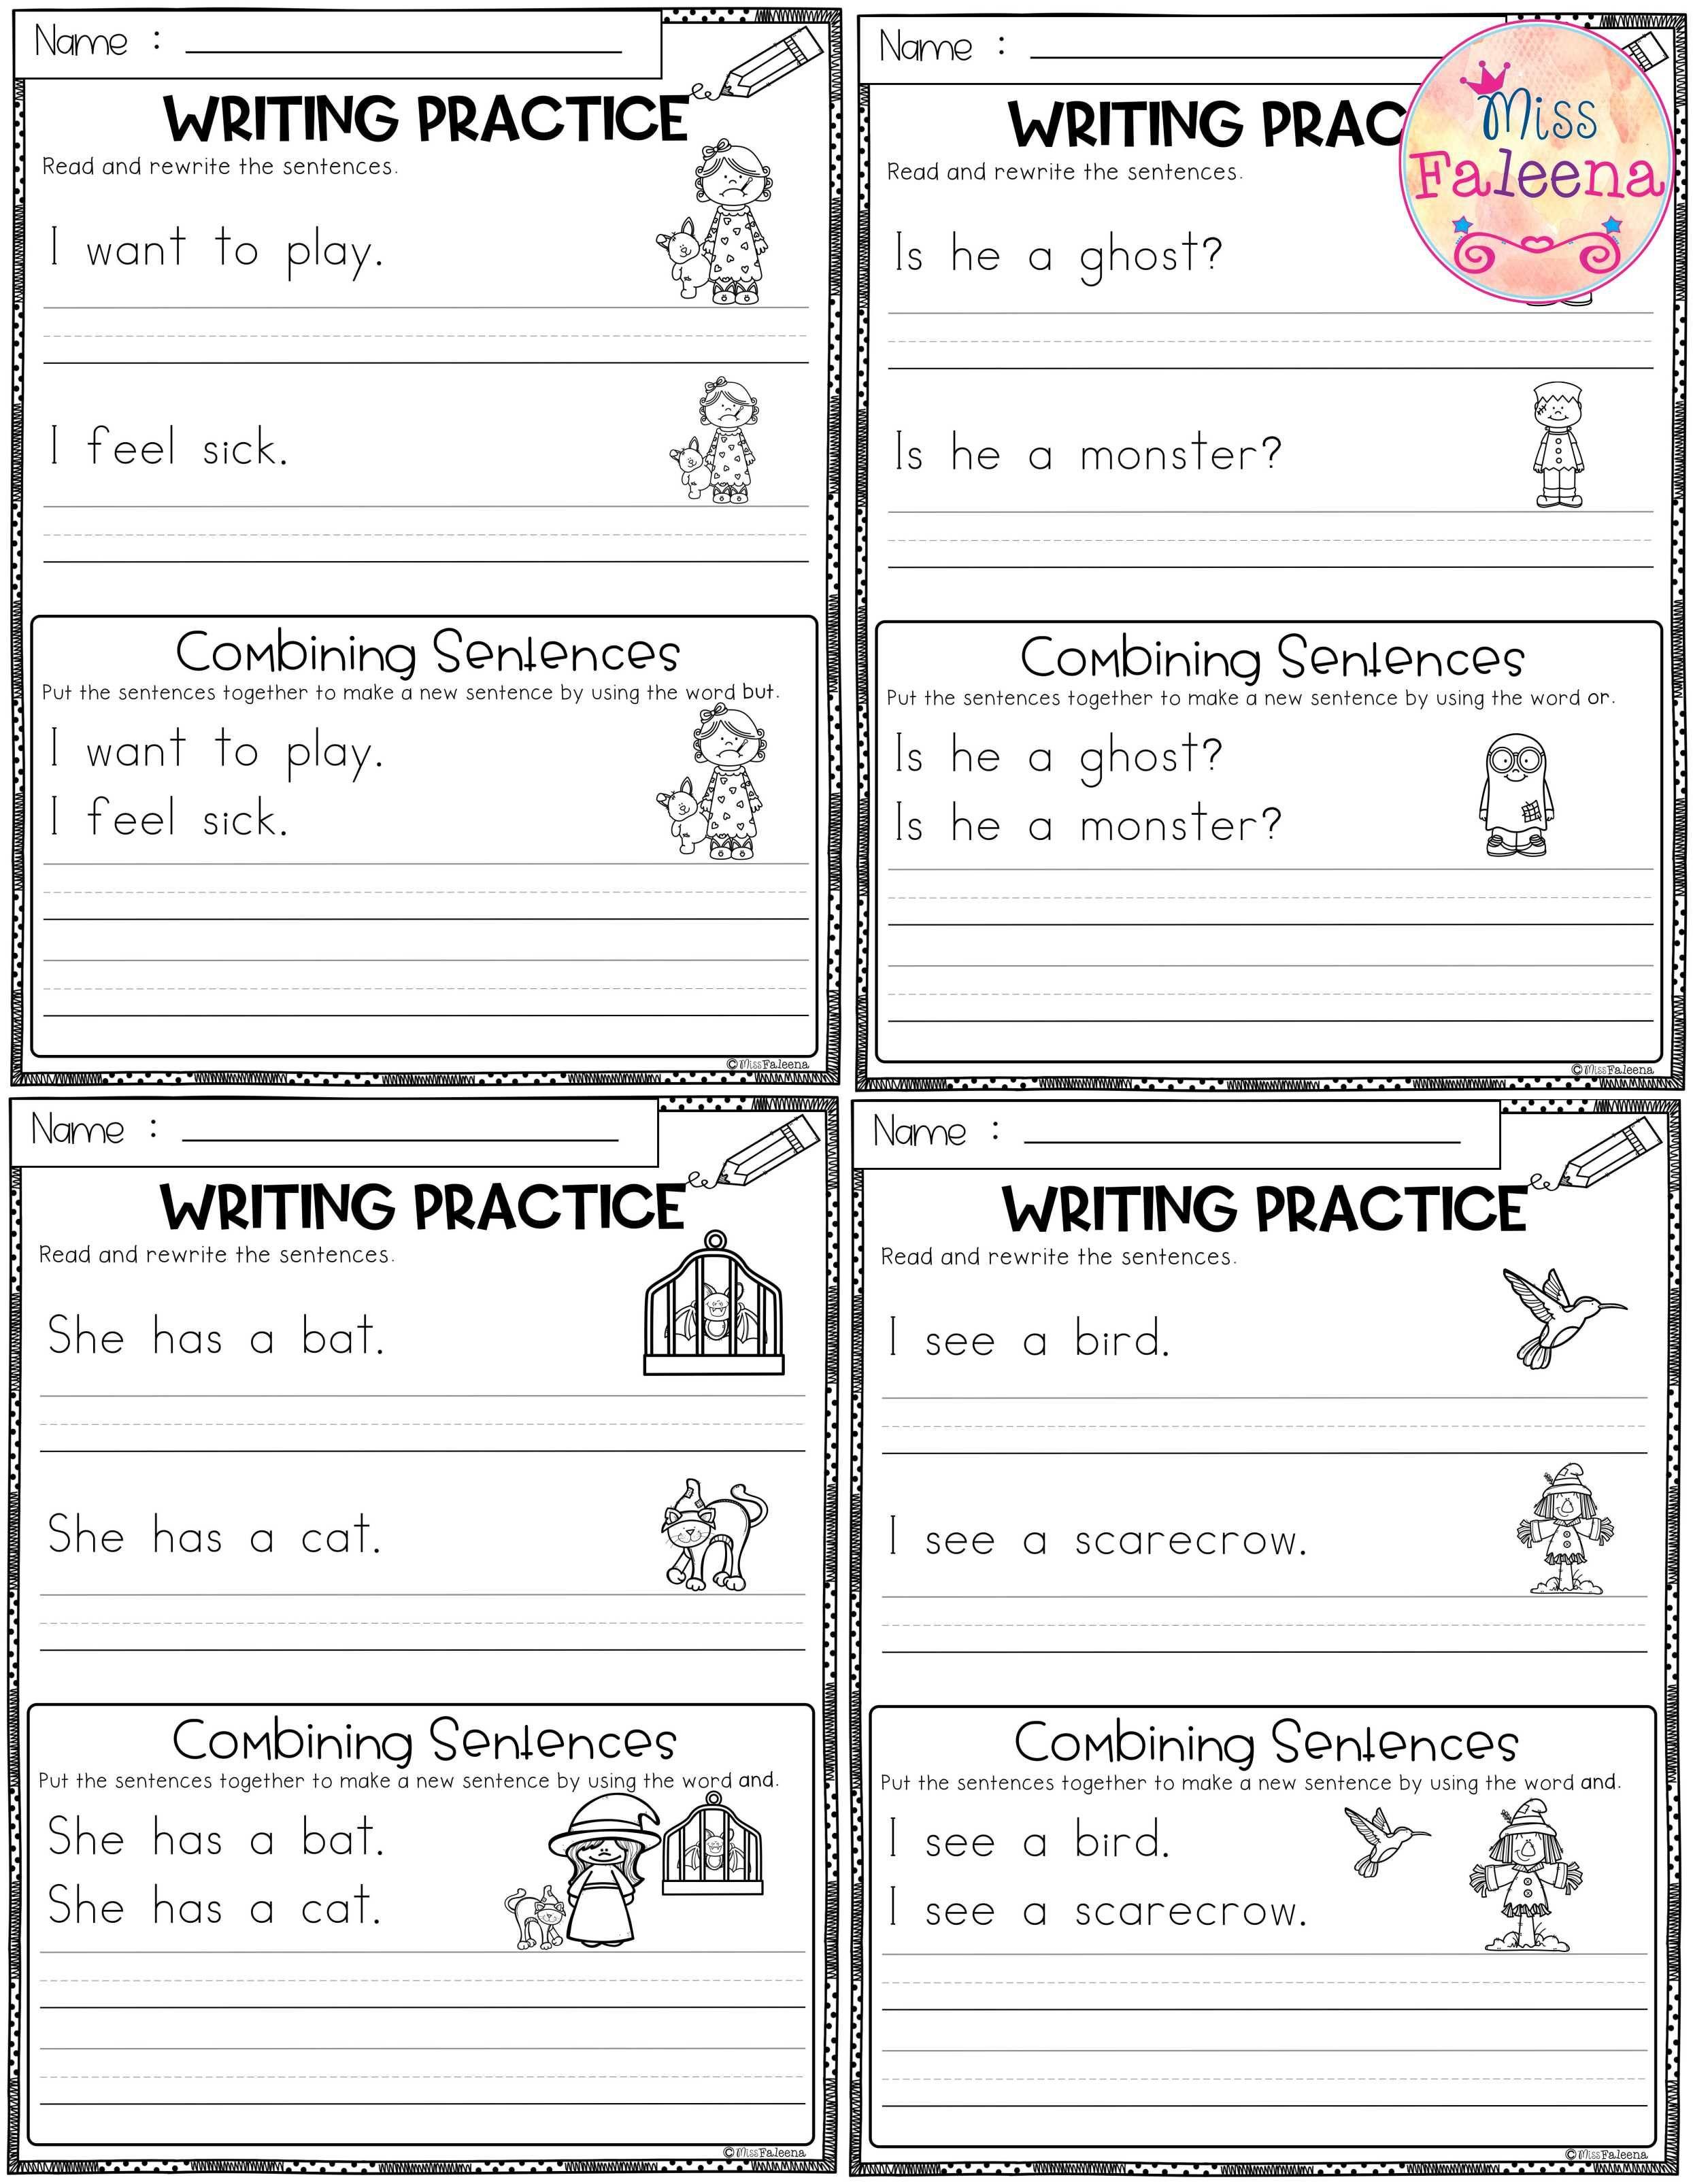 October Writing Practice Combining Sentences